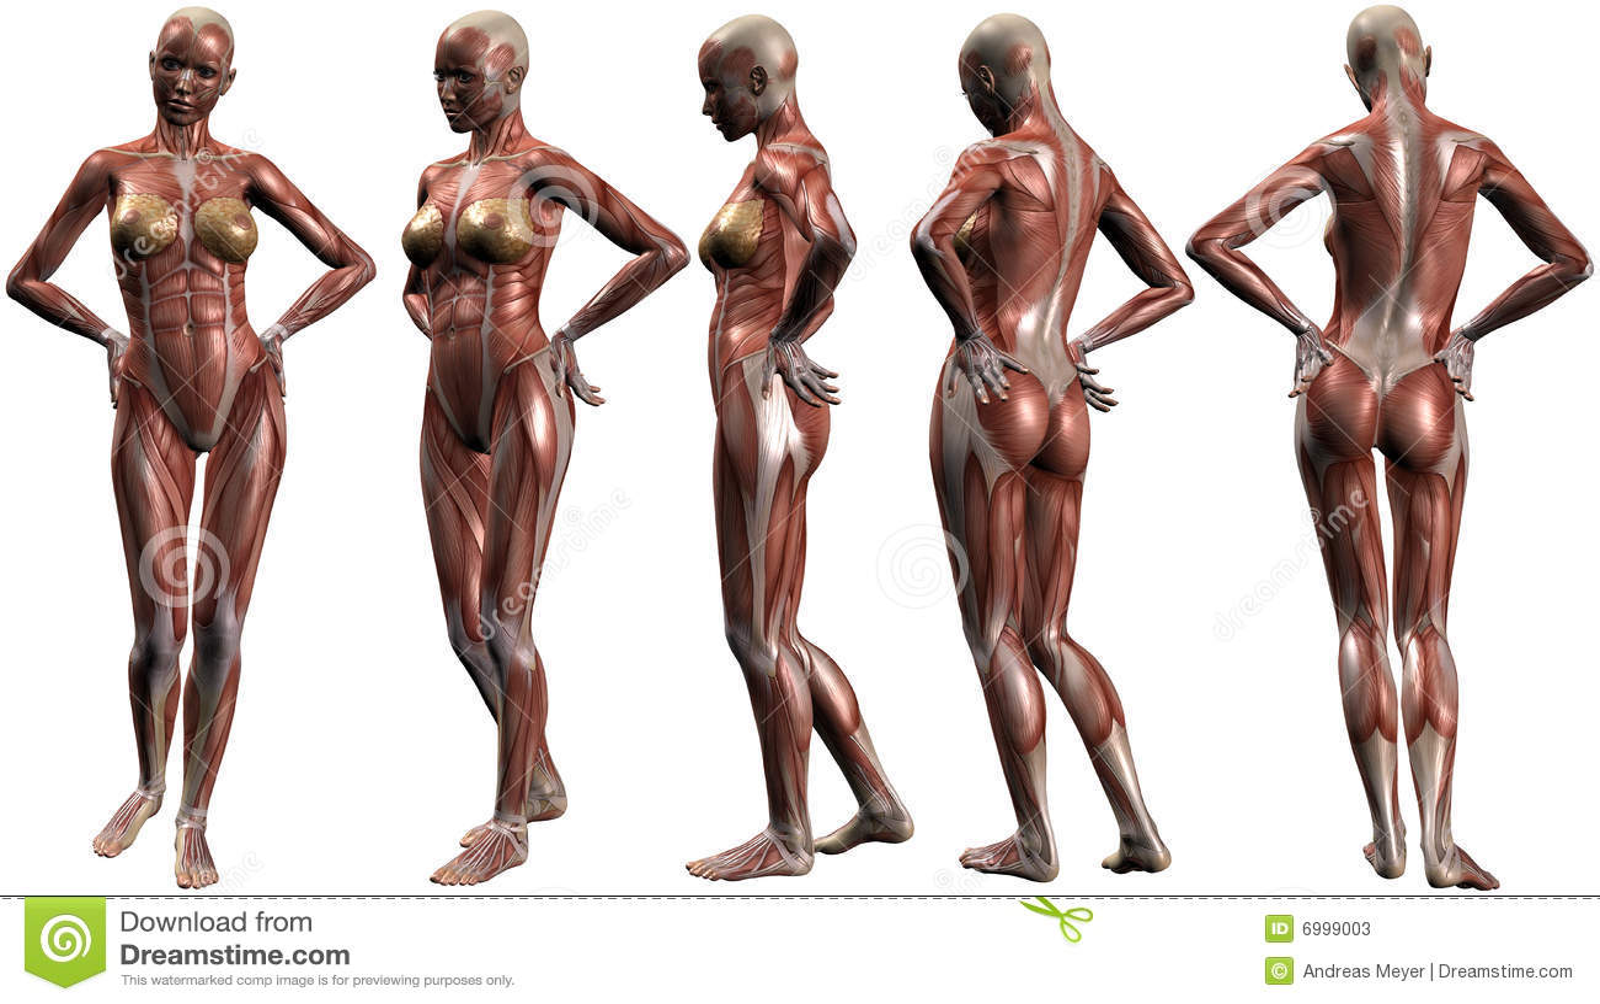 Female Human Body Anatomy Stock Photos - Image: 6999003